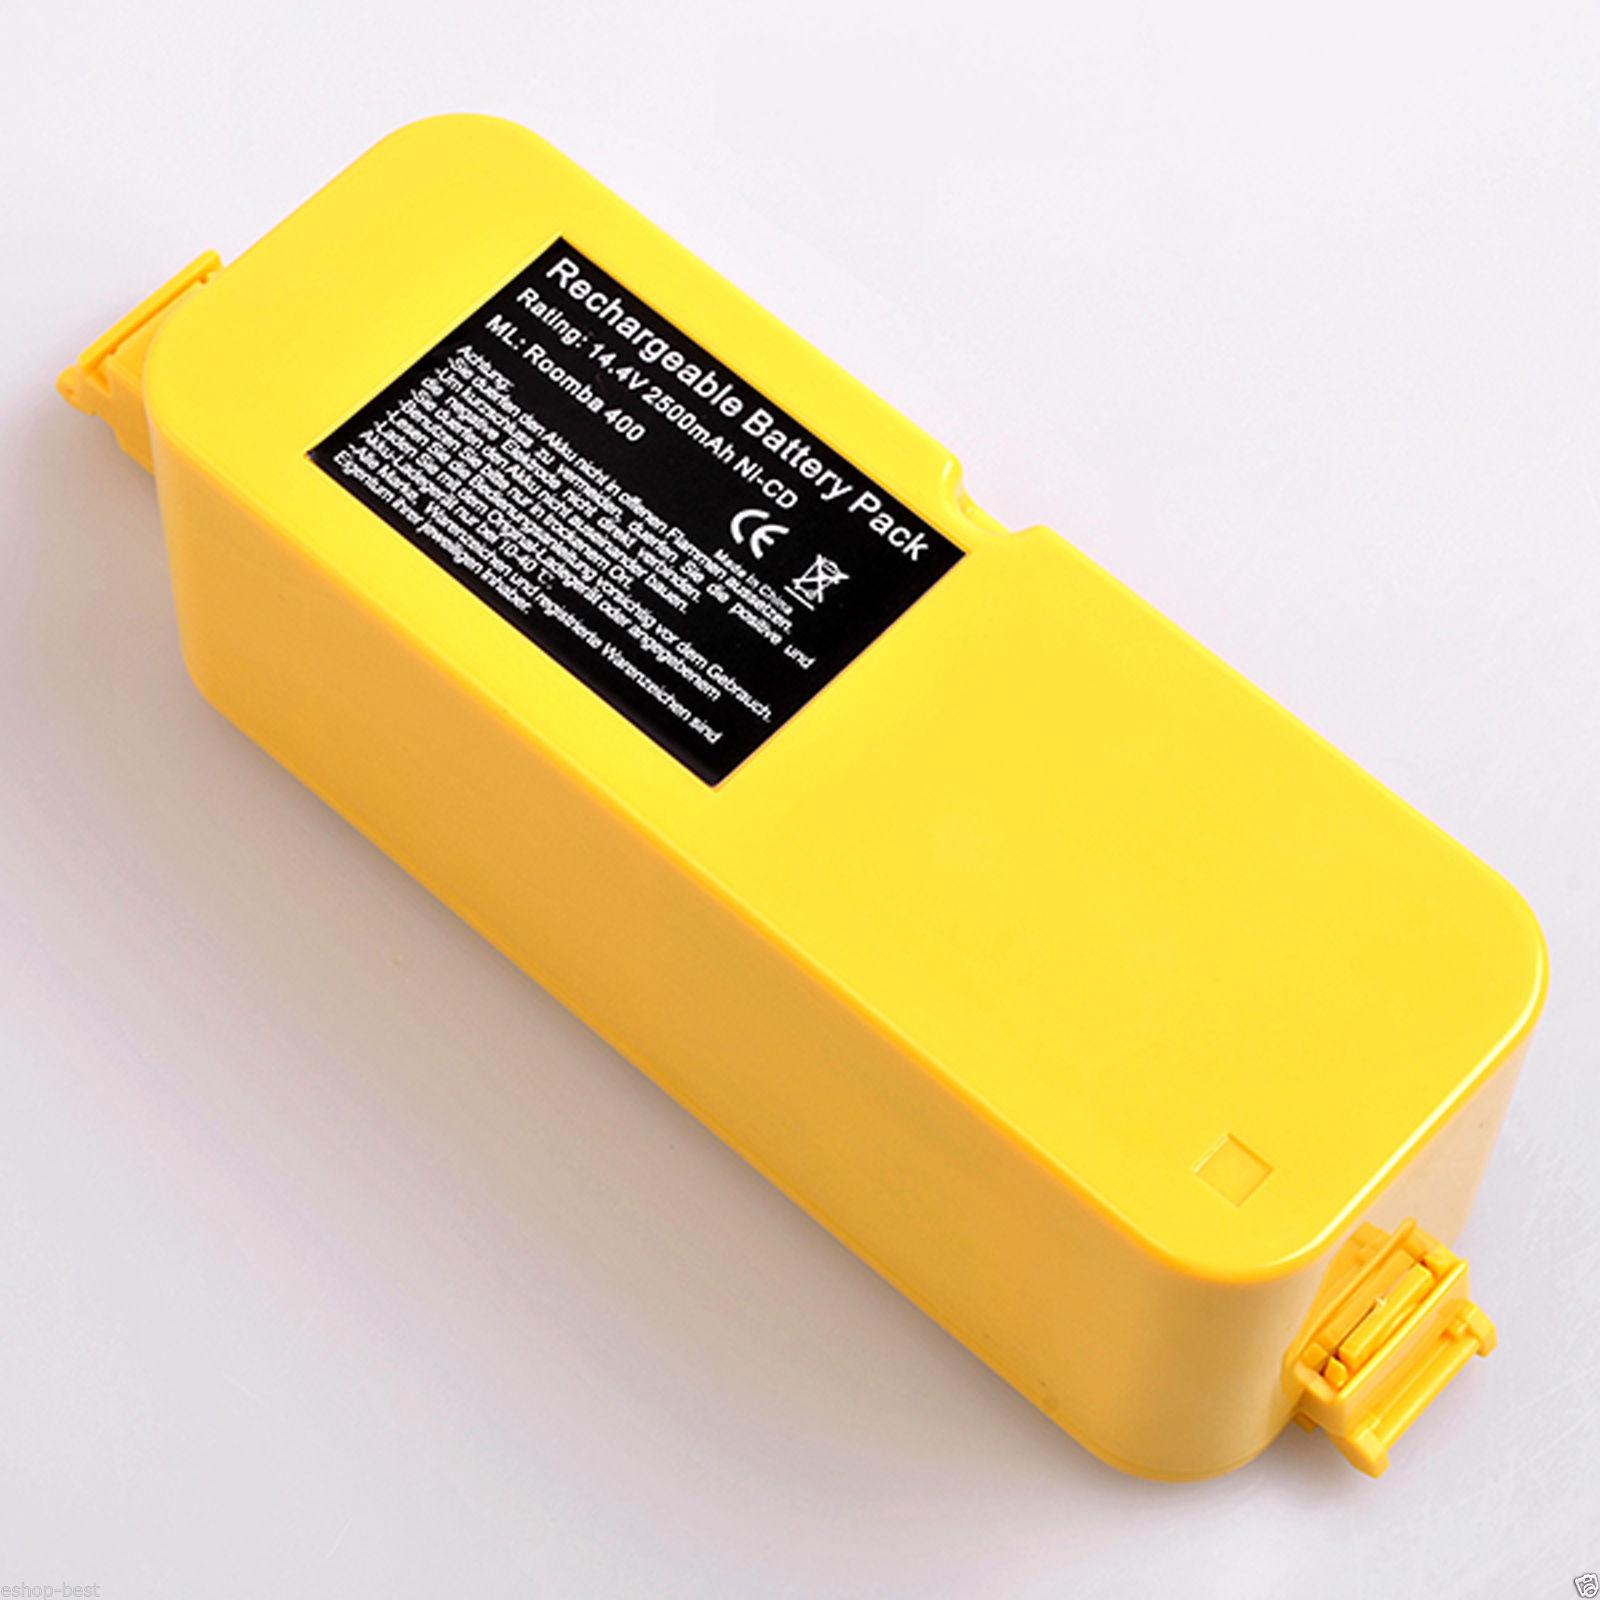 2500mah battery for irobot roomba 400 405 410 415 416 4210 4170 vacuum cleaner ebay. Black Bedroom Furniture Sets. Home Design Ideas